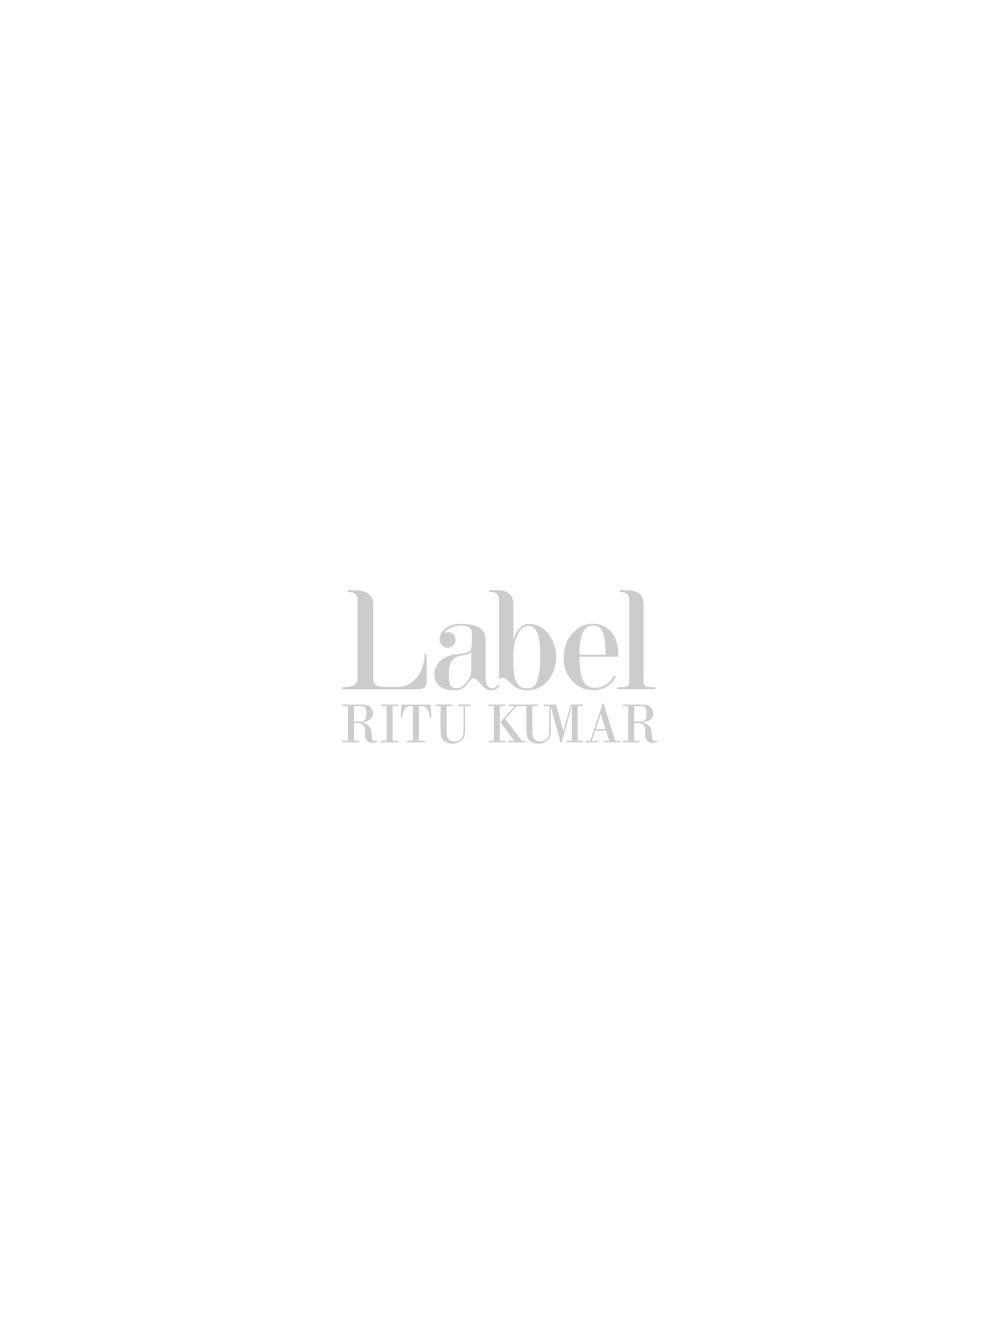 Rhea's Fashion Jewellery by Label Ritu Kumar